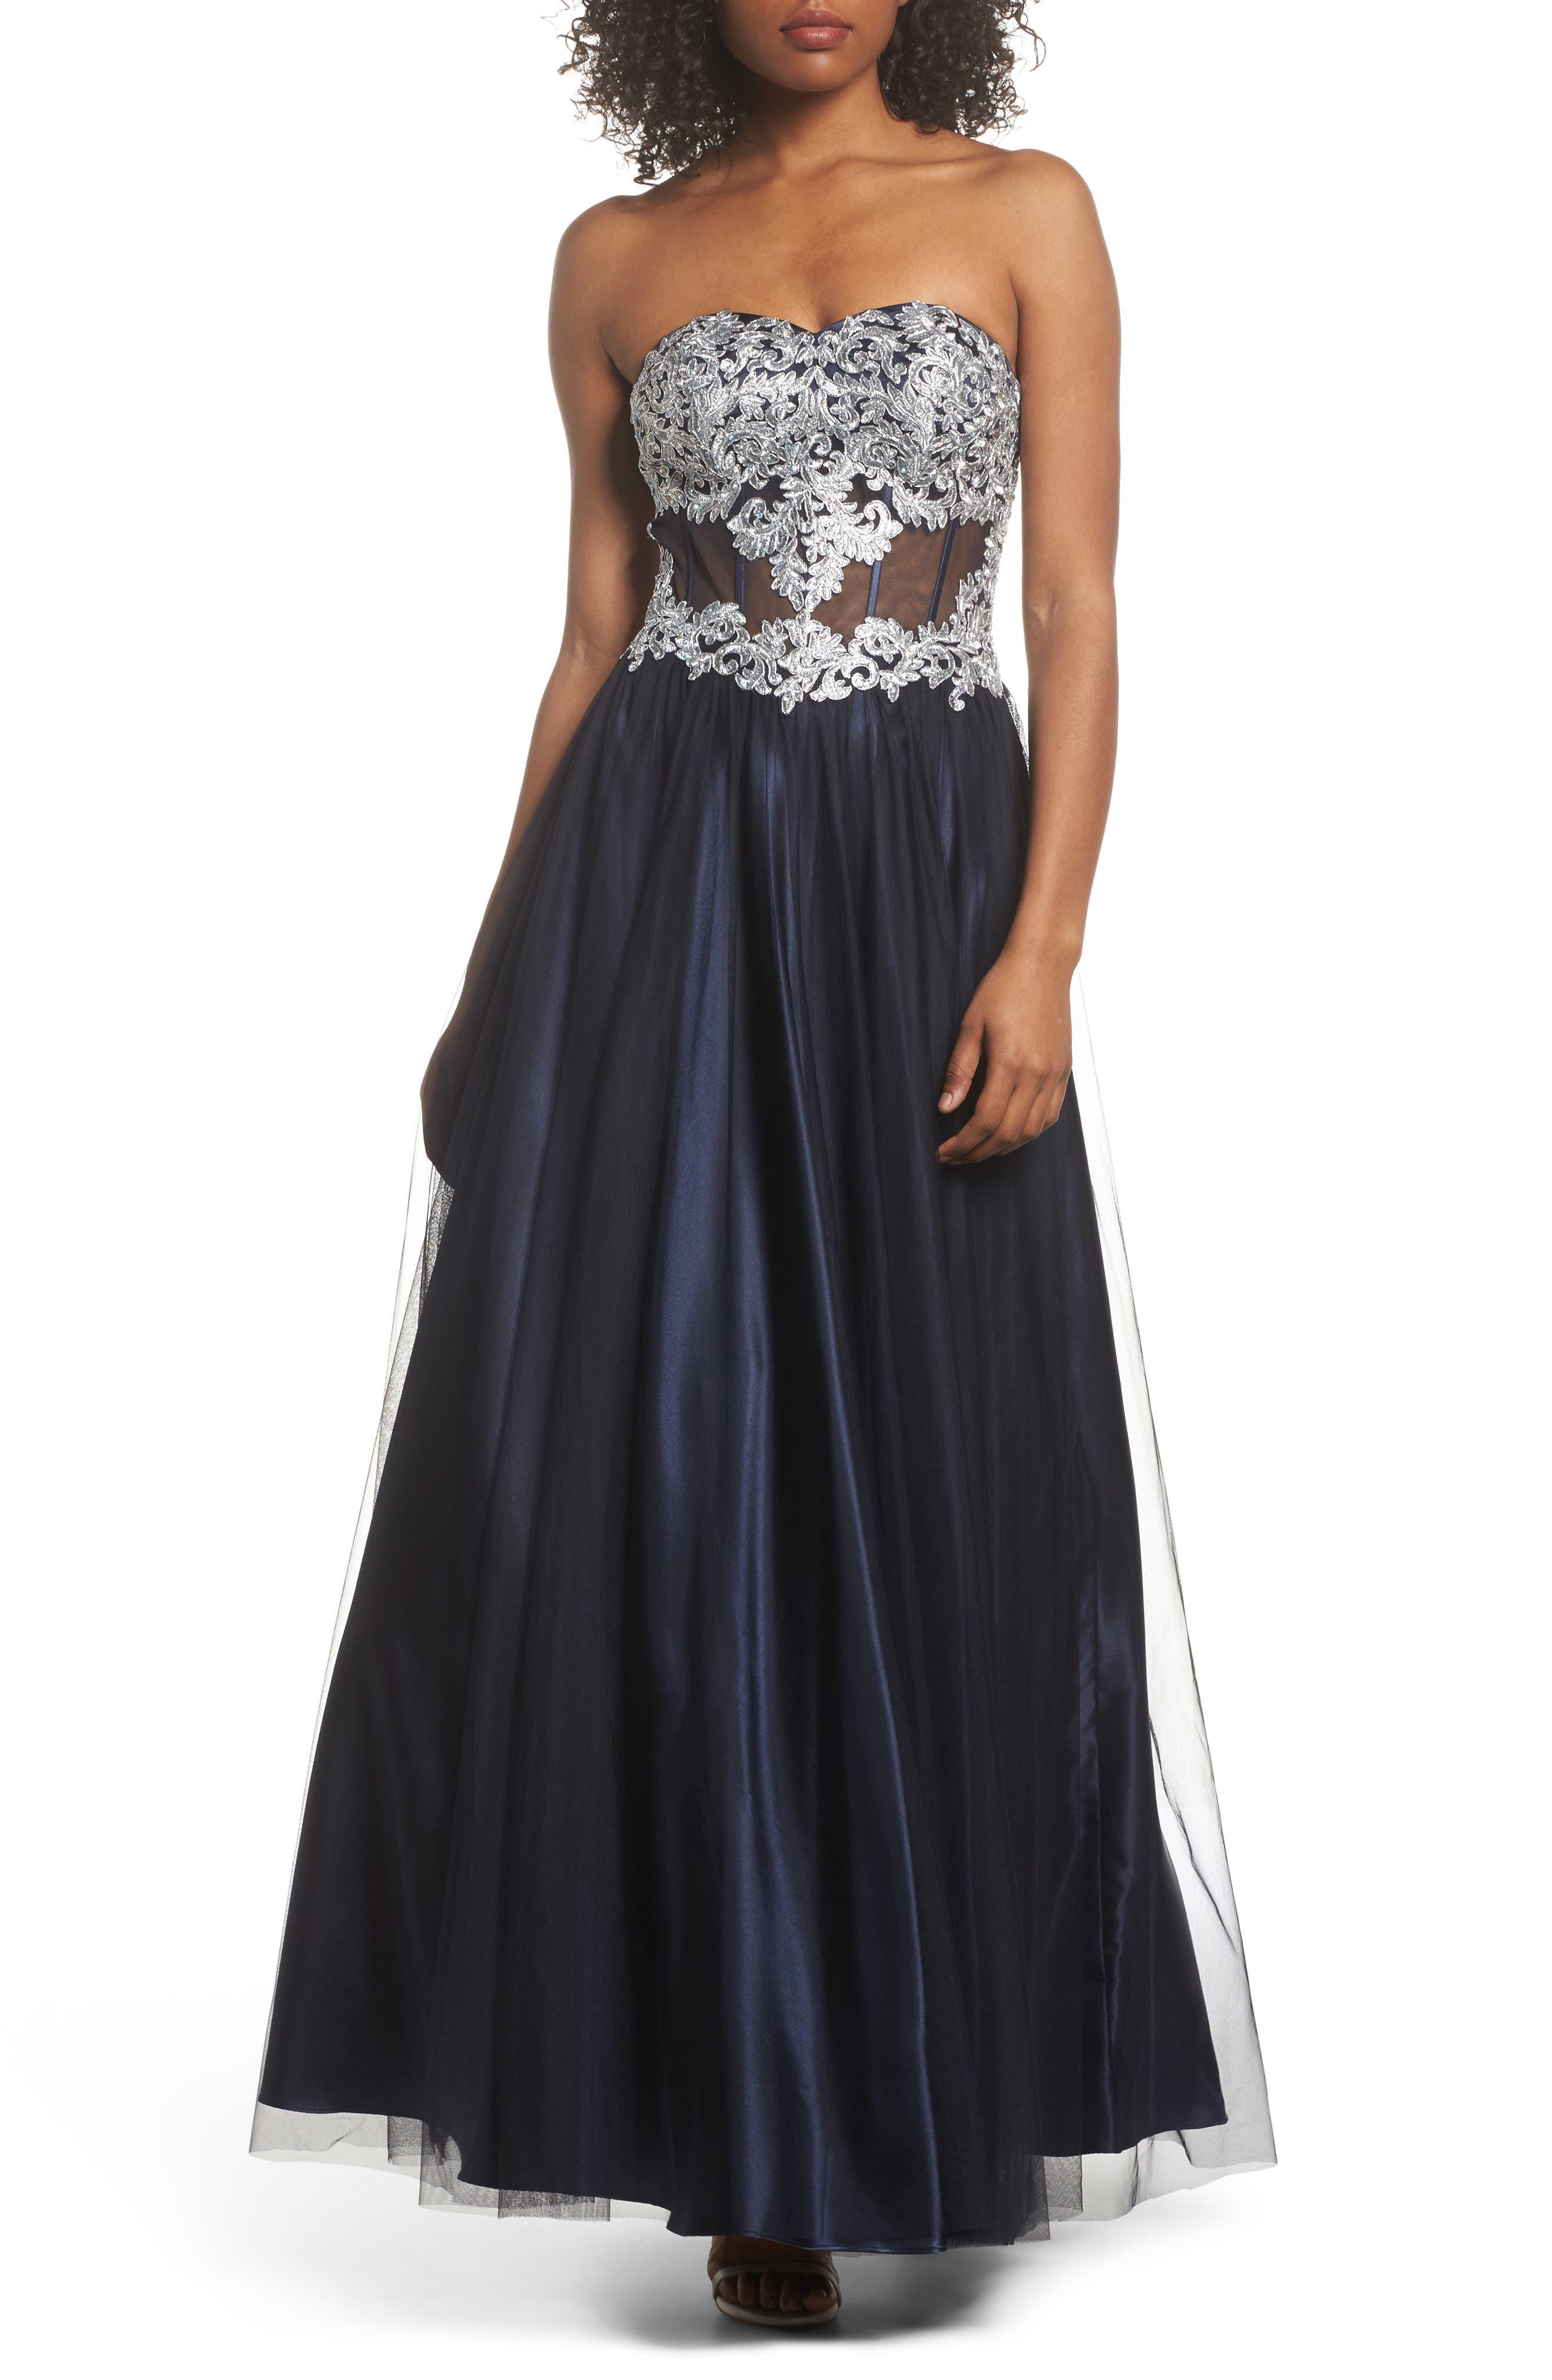 Blondie Nites Embellished Corset Ballgown, Blue